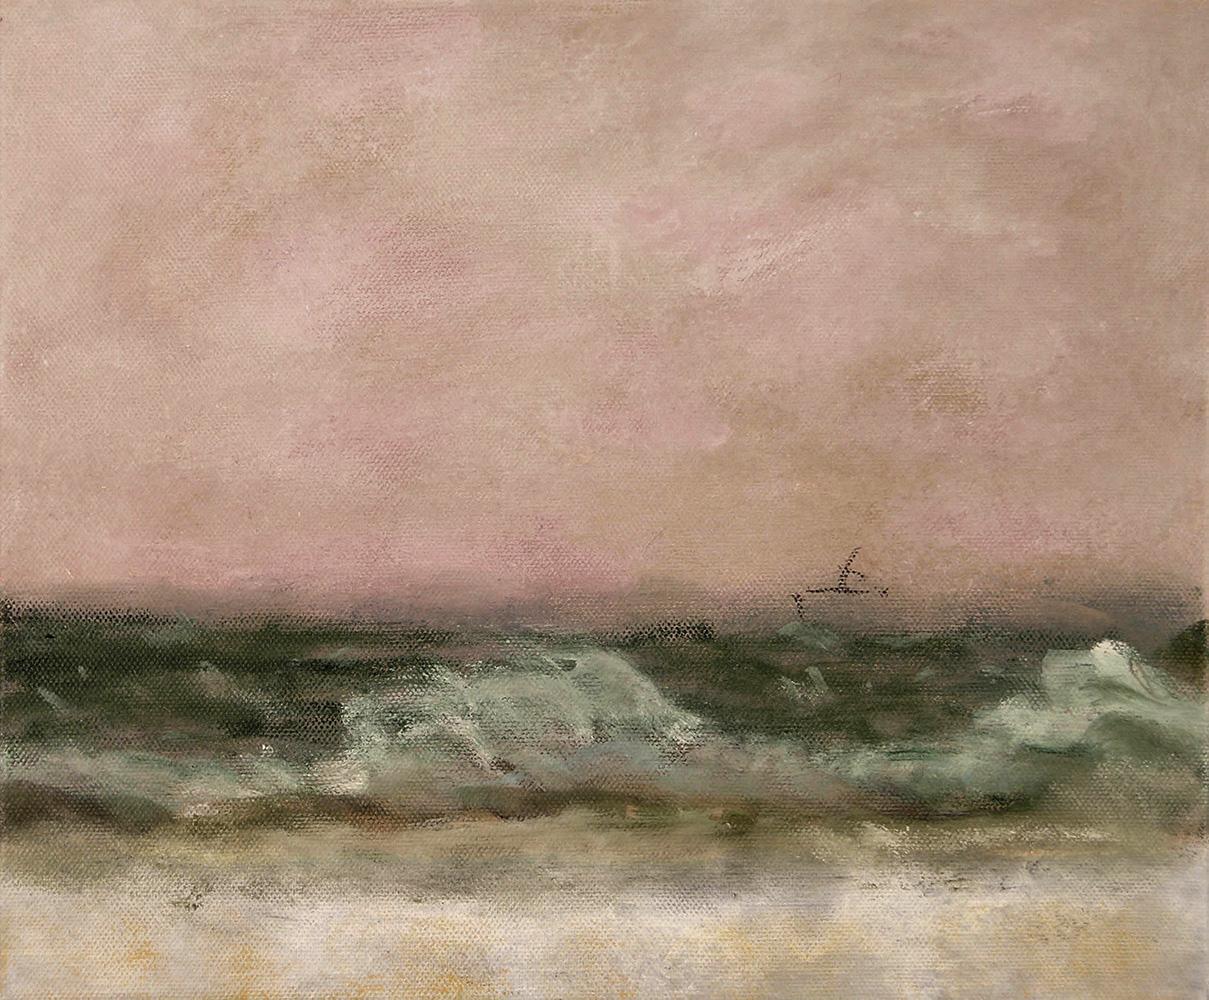 Untitled. Oil on Linen. 2010